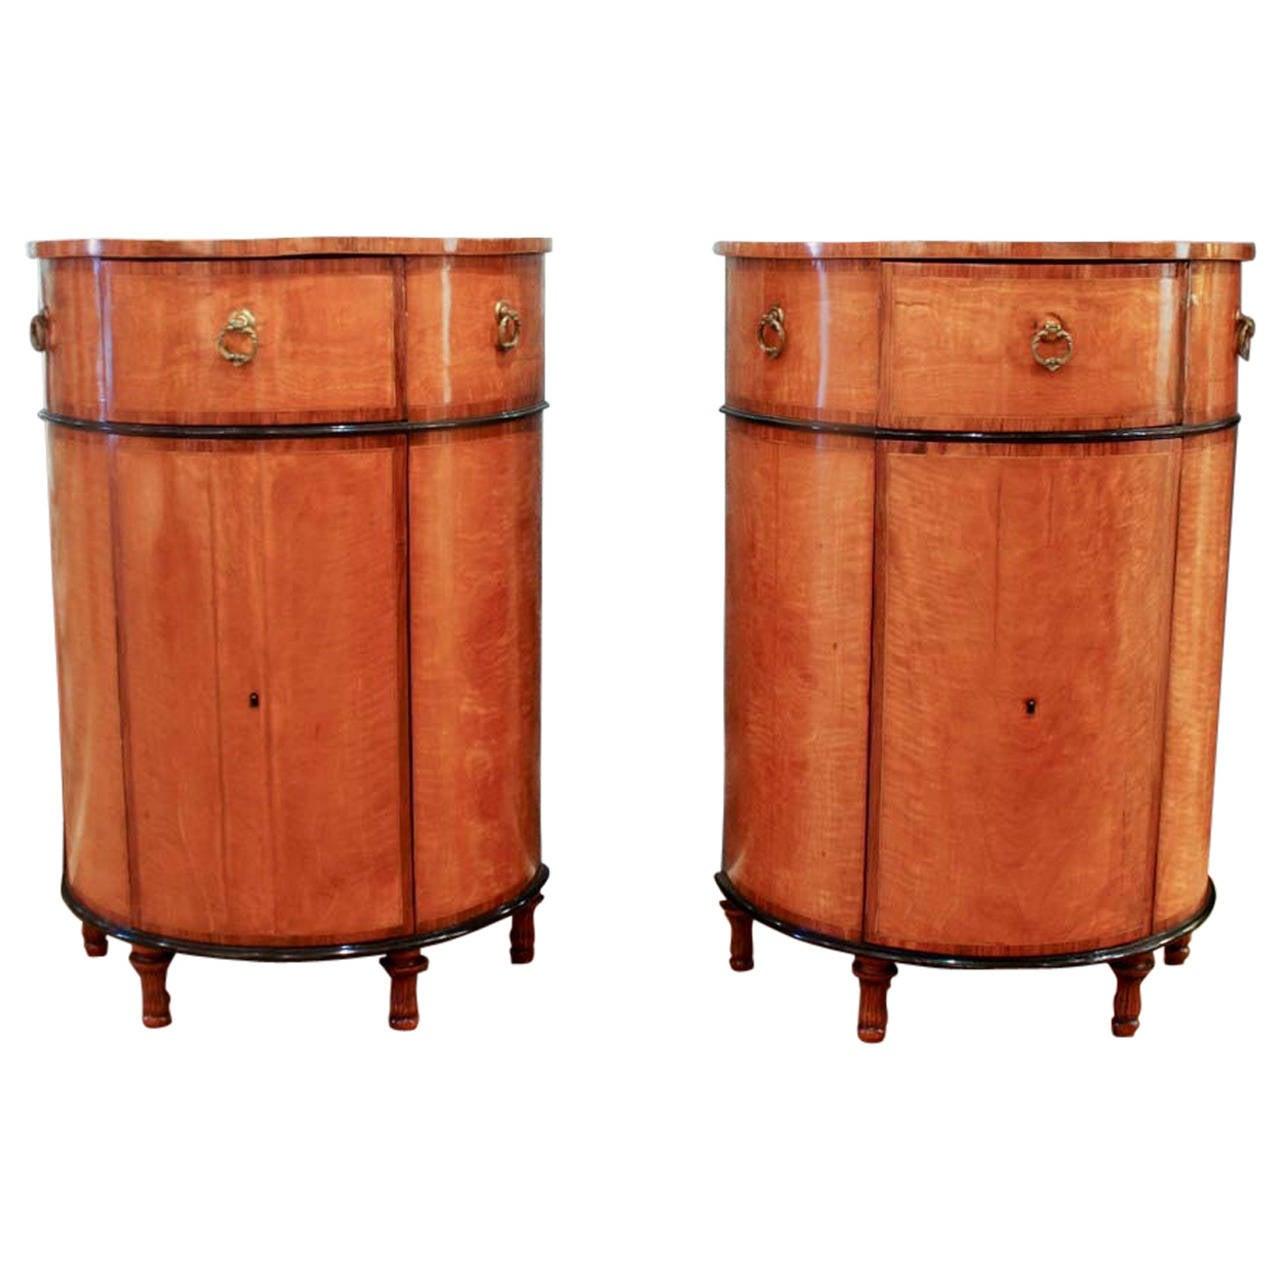 Pair of Sheraton Inlaid Satinwood Demilune Cabinets